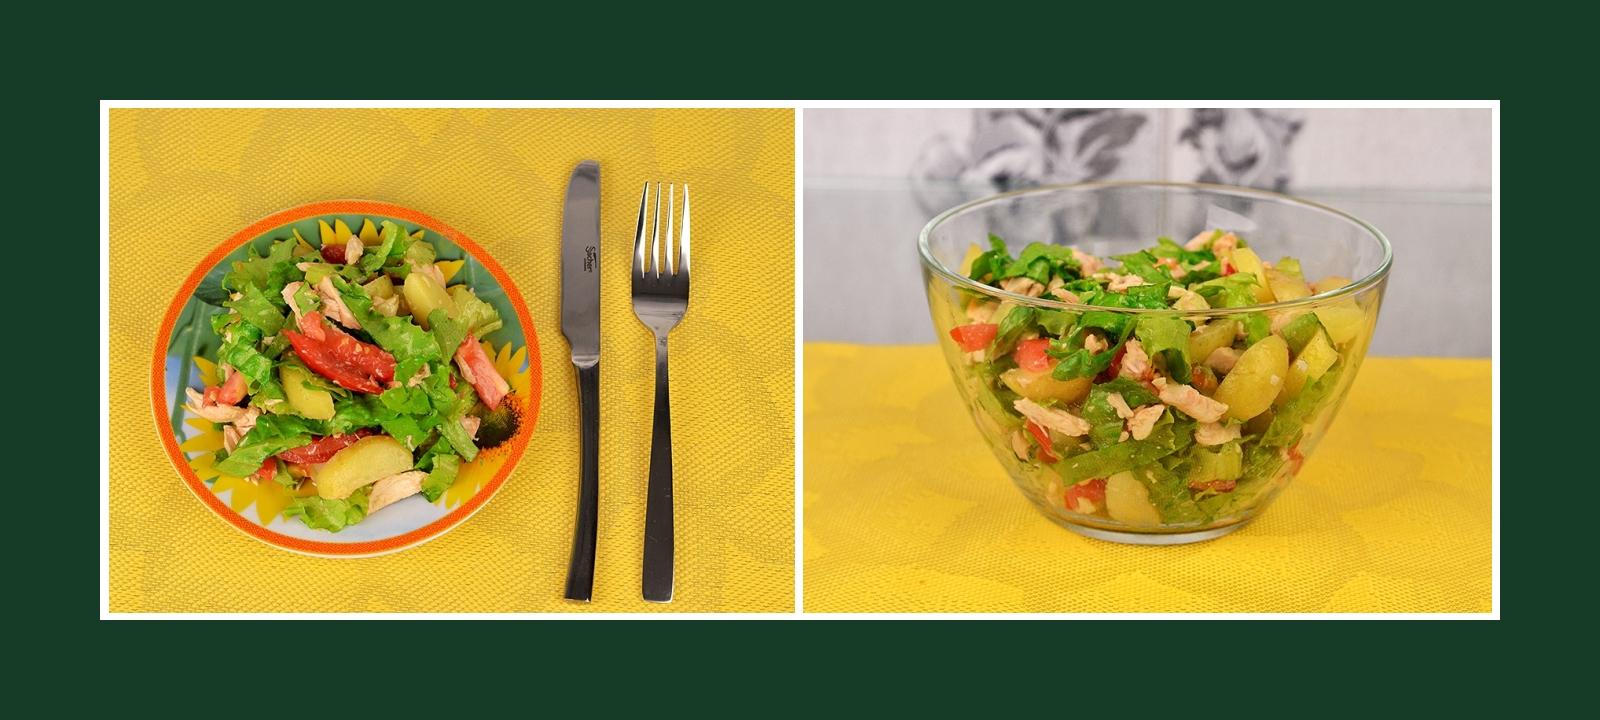 Leckerer Salat aus Frühkartoffeln, Hähnchenfleisch, Tomaten, Salat